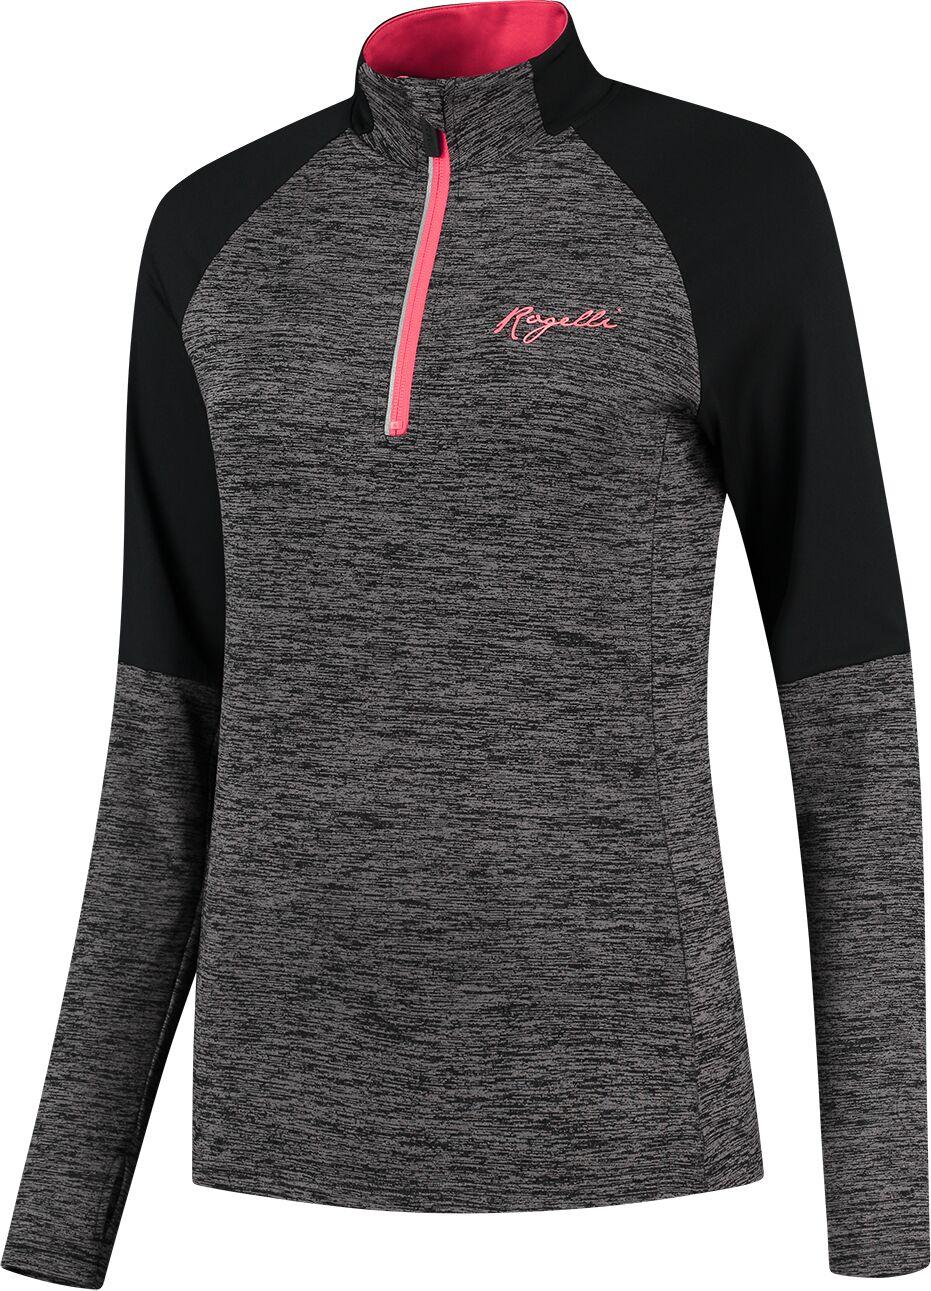 ROGELLI bluza do biegania damska ENJOY grey ROG351109 Rozmiar: 2XL,ROG351109.XS